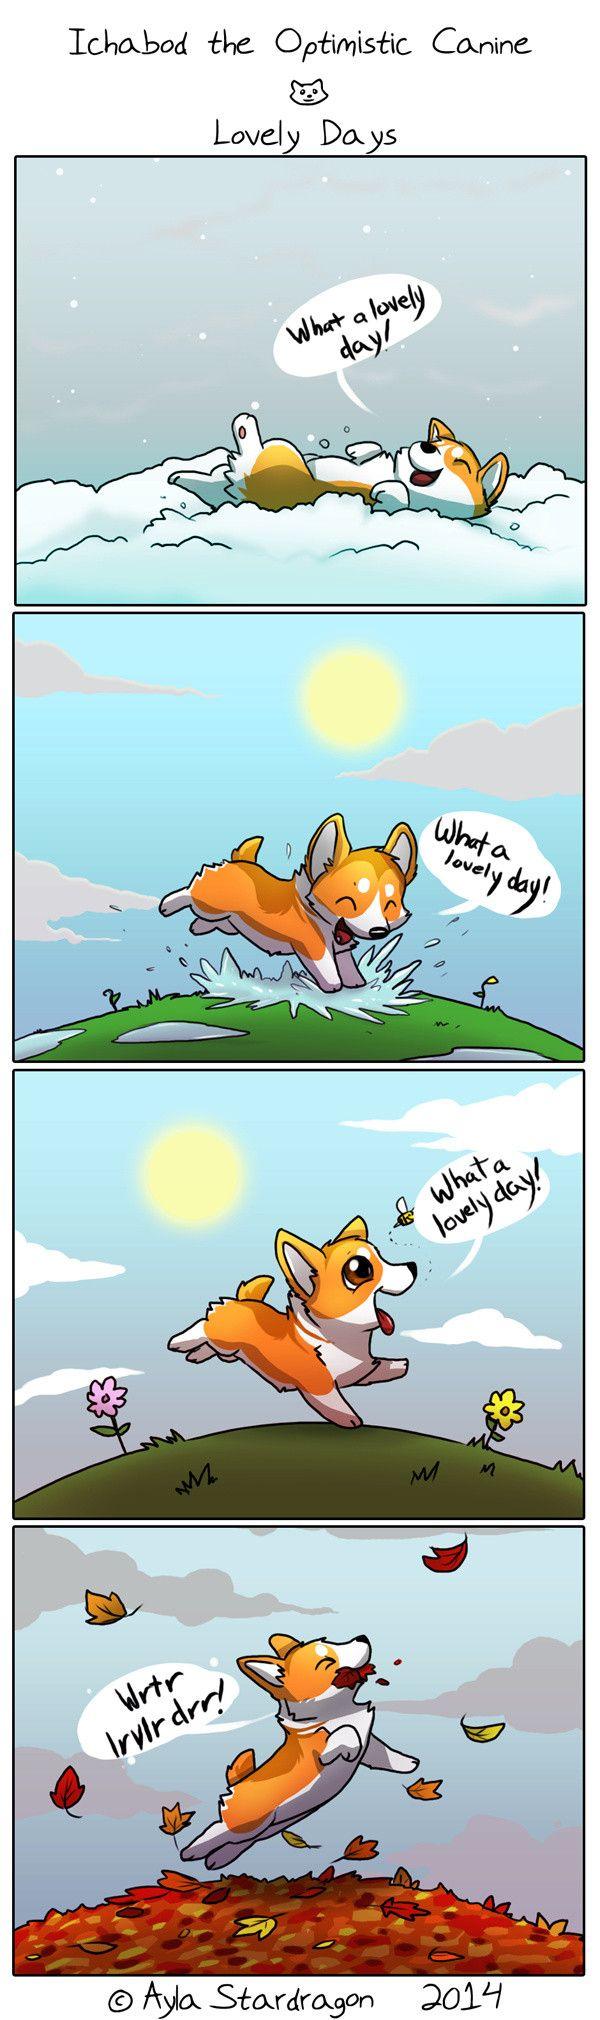 Ichabod the Optimistic Canine Comic <3